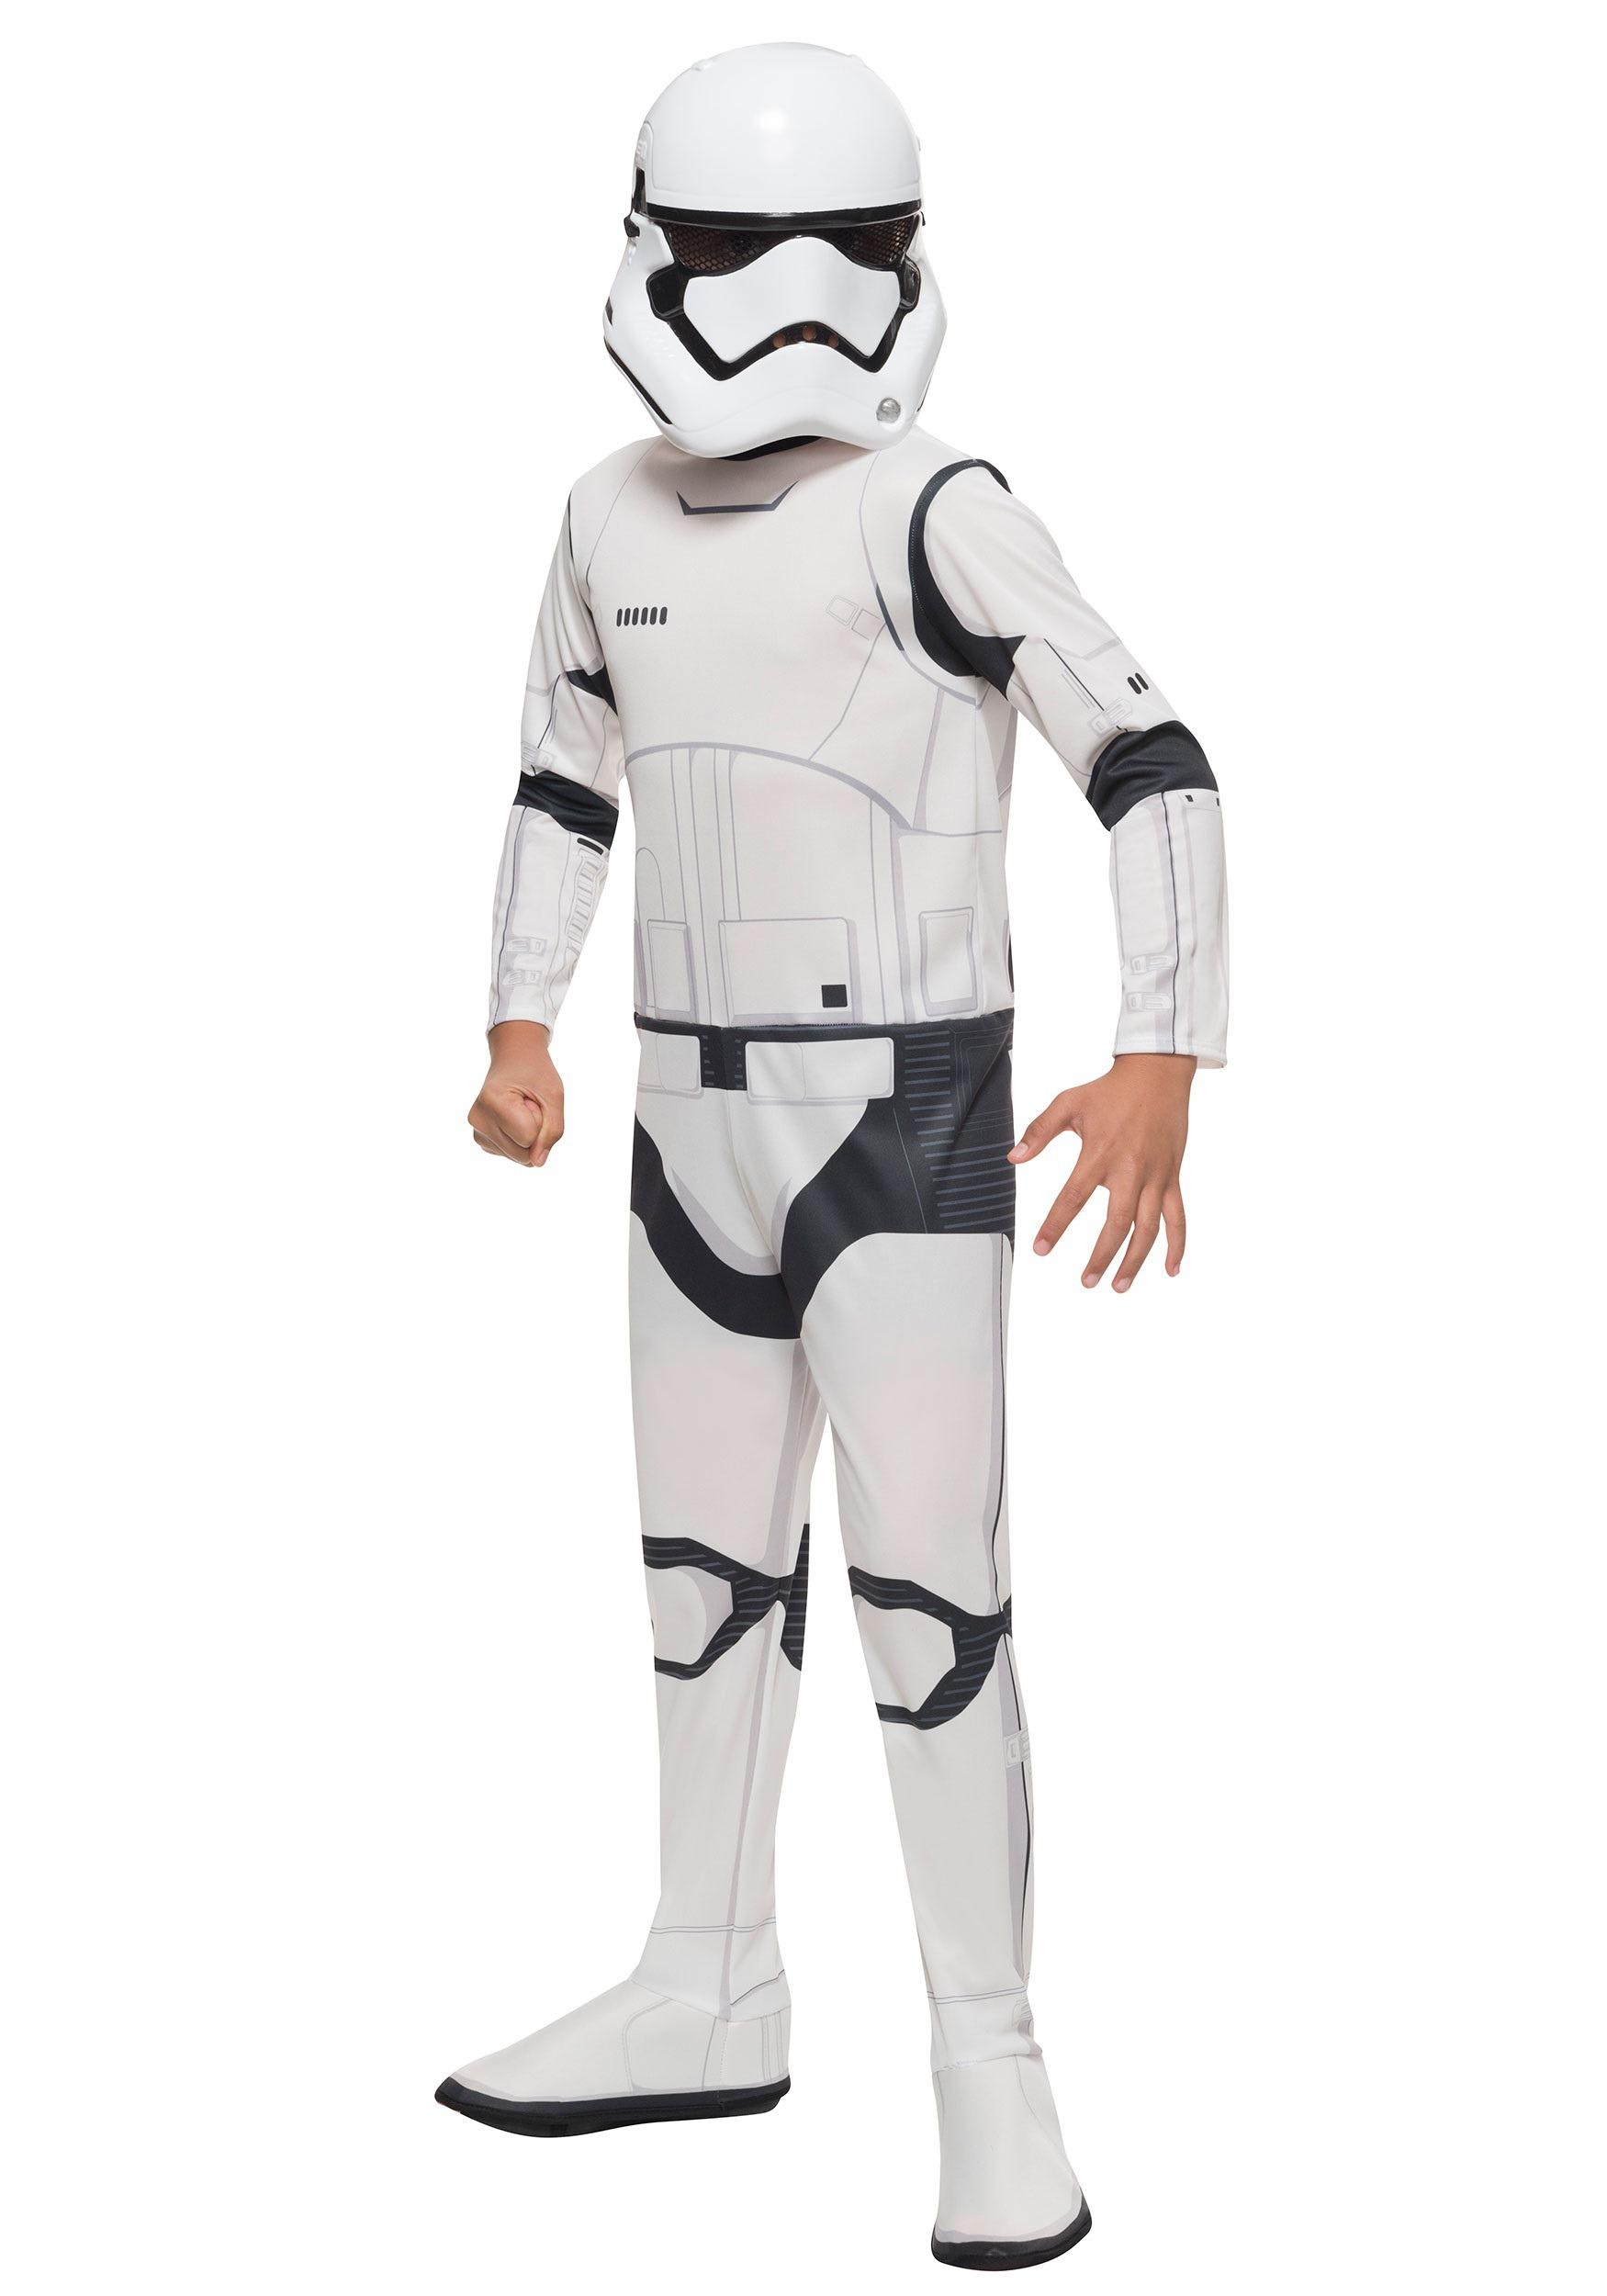 Child Classic Star Wars Ep. 7 Stormtrooper Costume  sc 1 st  Halloween Costumes EU & Child Classic Star Wars The Force Awakens Stormtrooper Costume